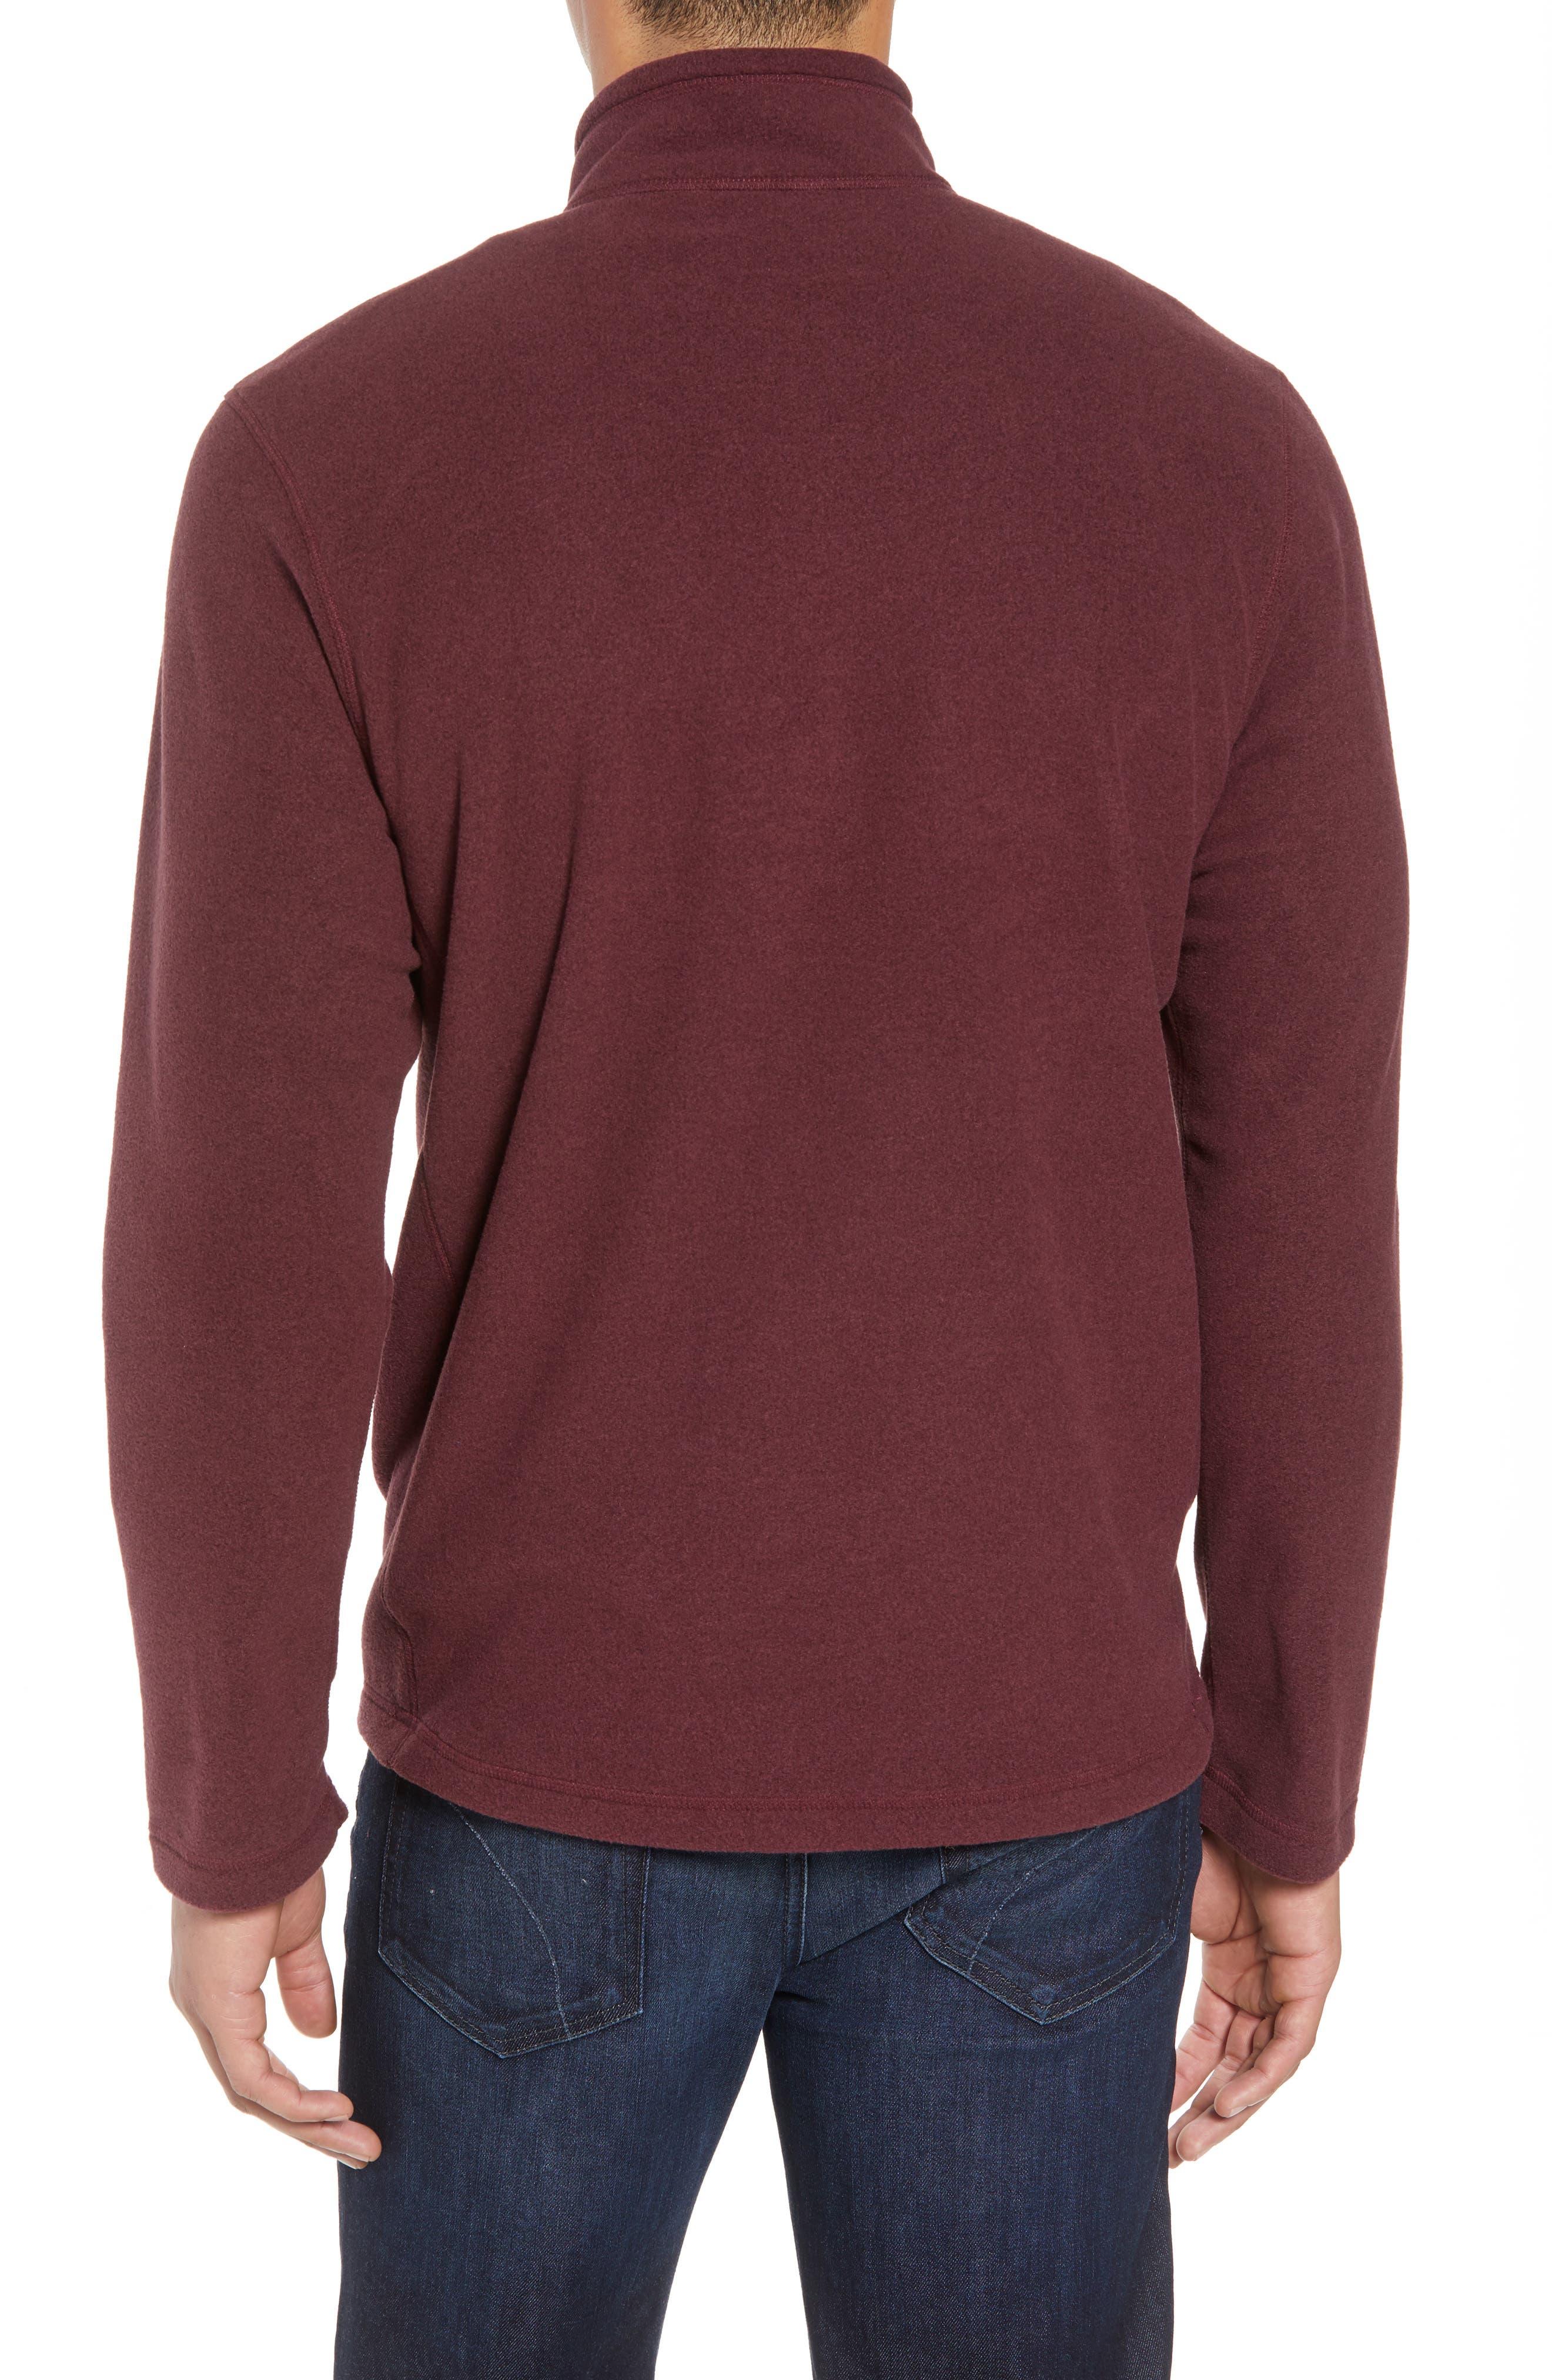 'TKA 100 Glacier' Quarter Zip Fleece Pullover,                             Alternate thumbnail 50, color,